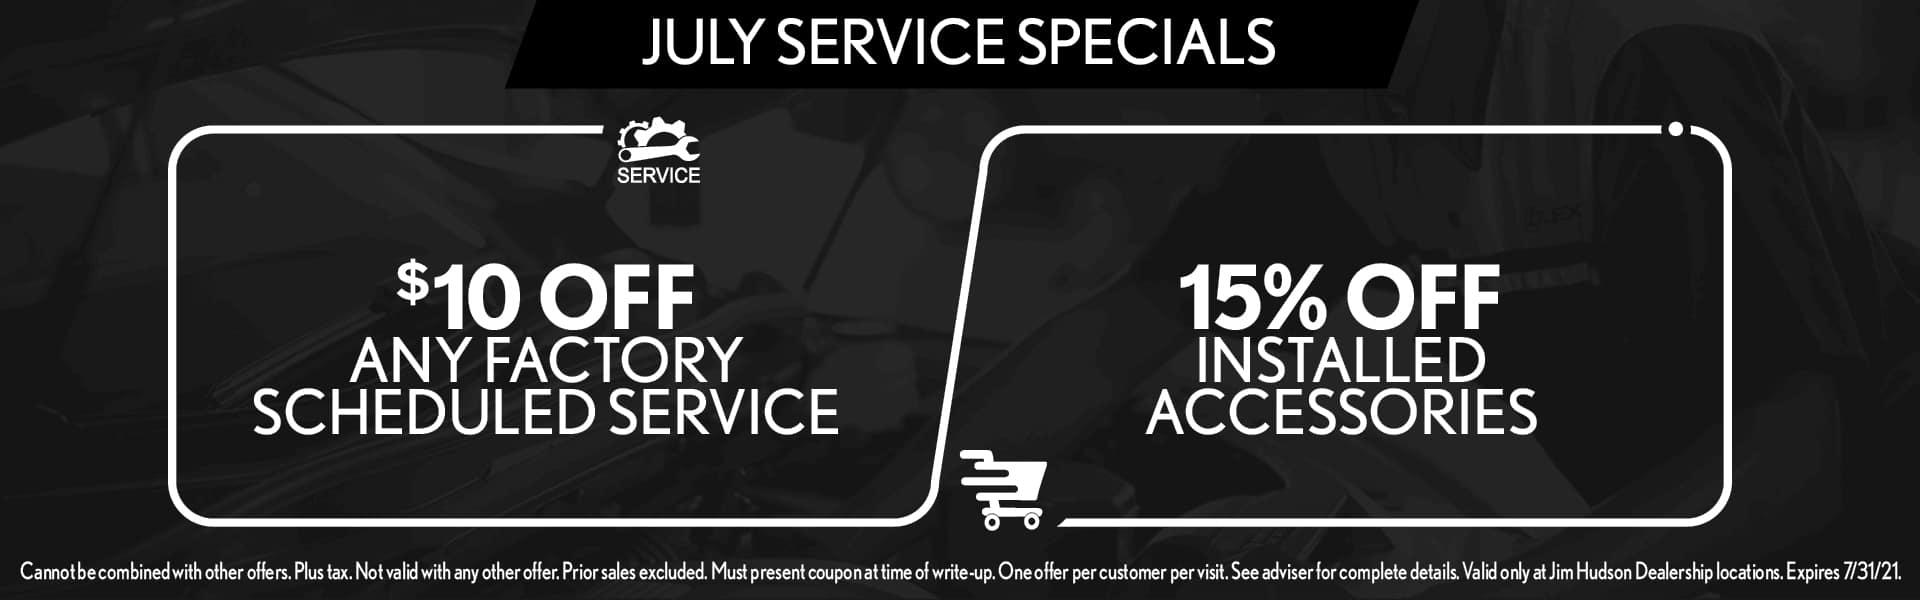 1714526-JHL-JUly SERVICE OFFER WEB BANNERS-1920-600